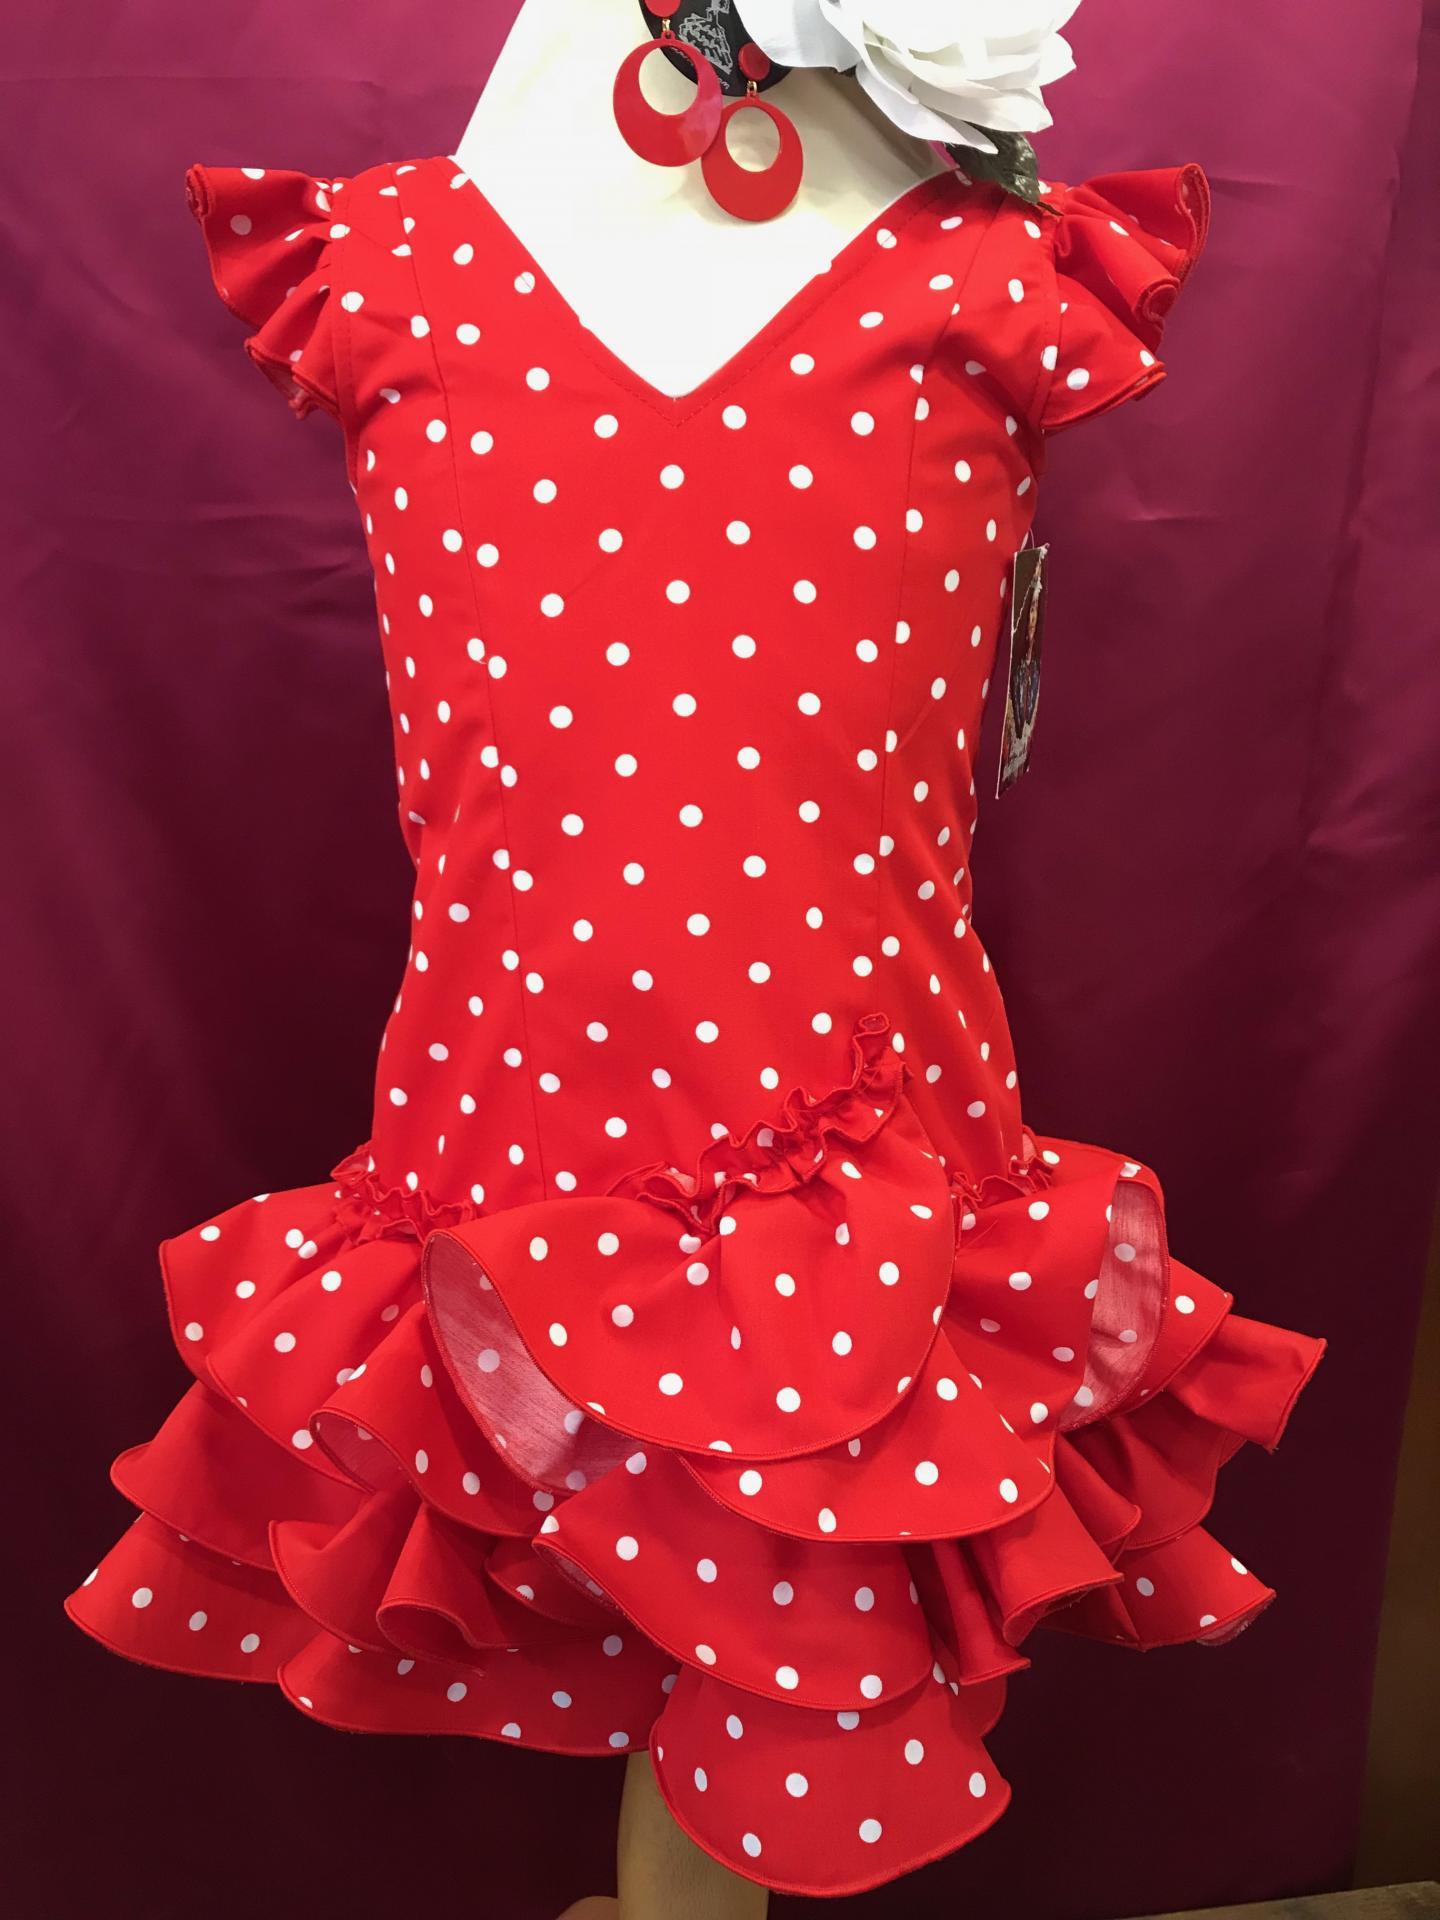 Vestido flamenca niña fondo rojo lunarillo blanco Tallas de la 0 a 14.